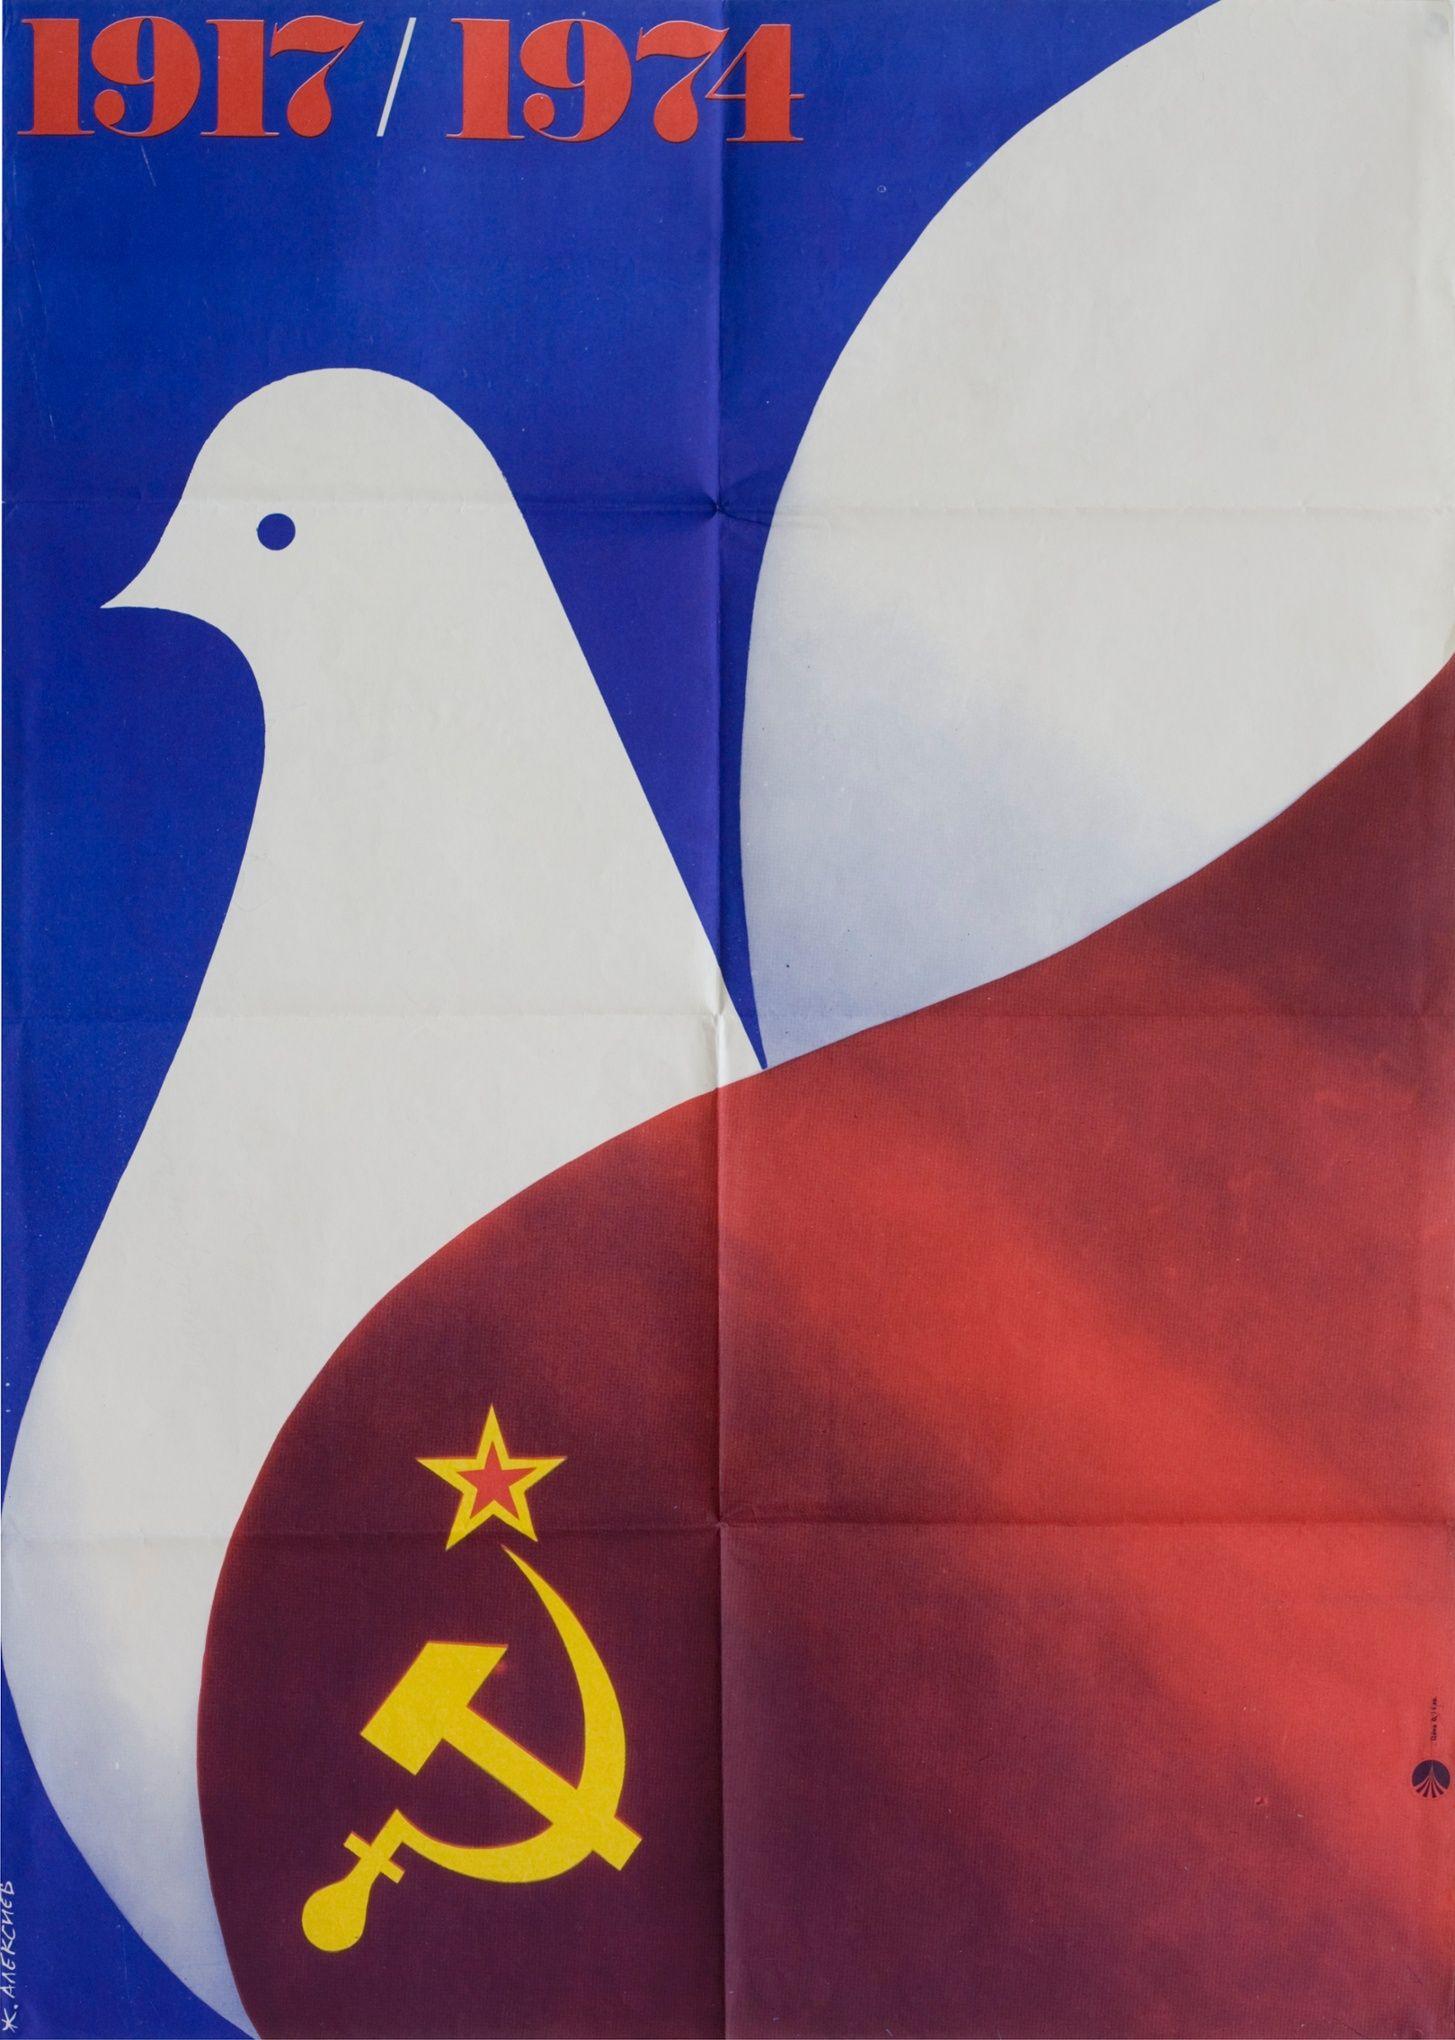 PROPAGANDA SATIRE HAMMER SICKLE DOVE COMMUNISM PEACE ART POSTER PRINT LV7020